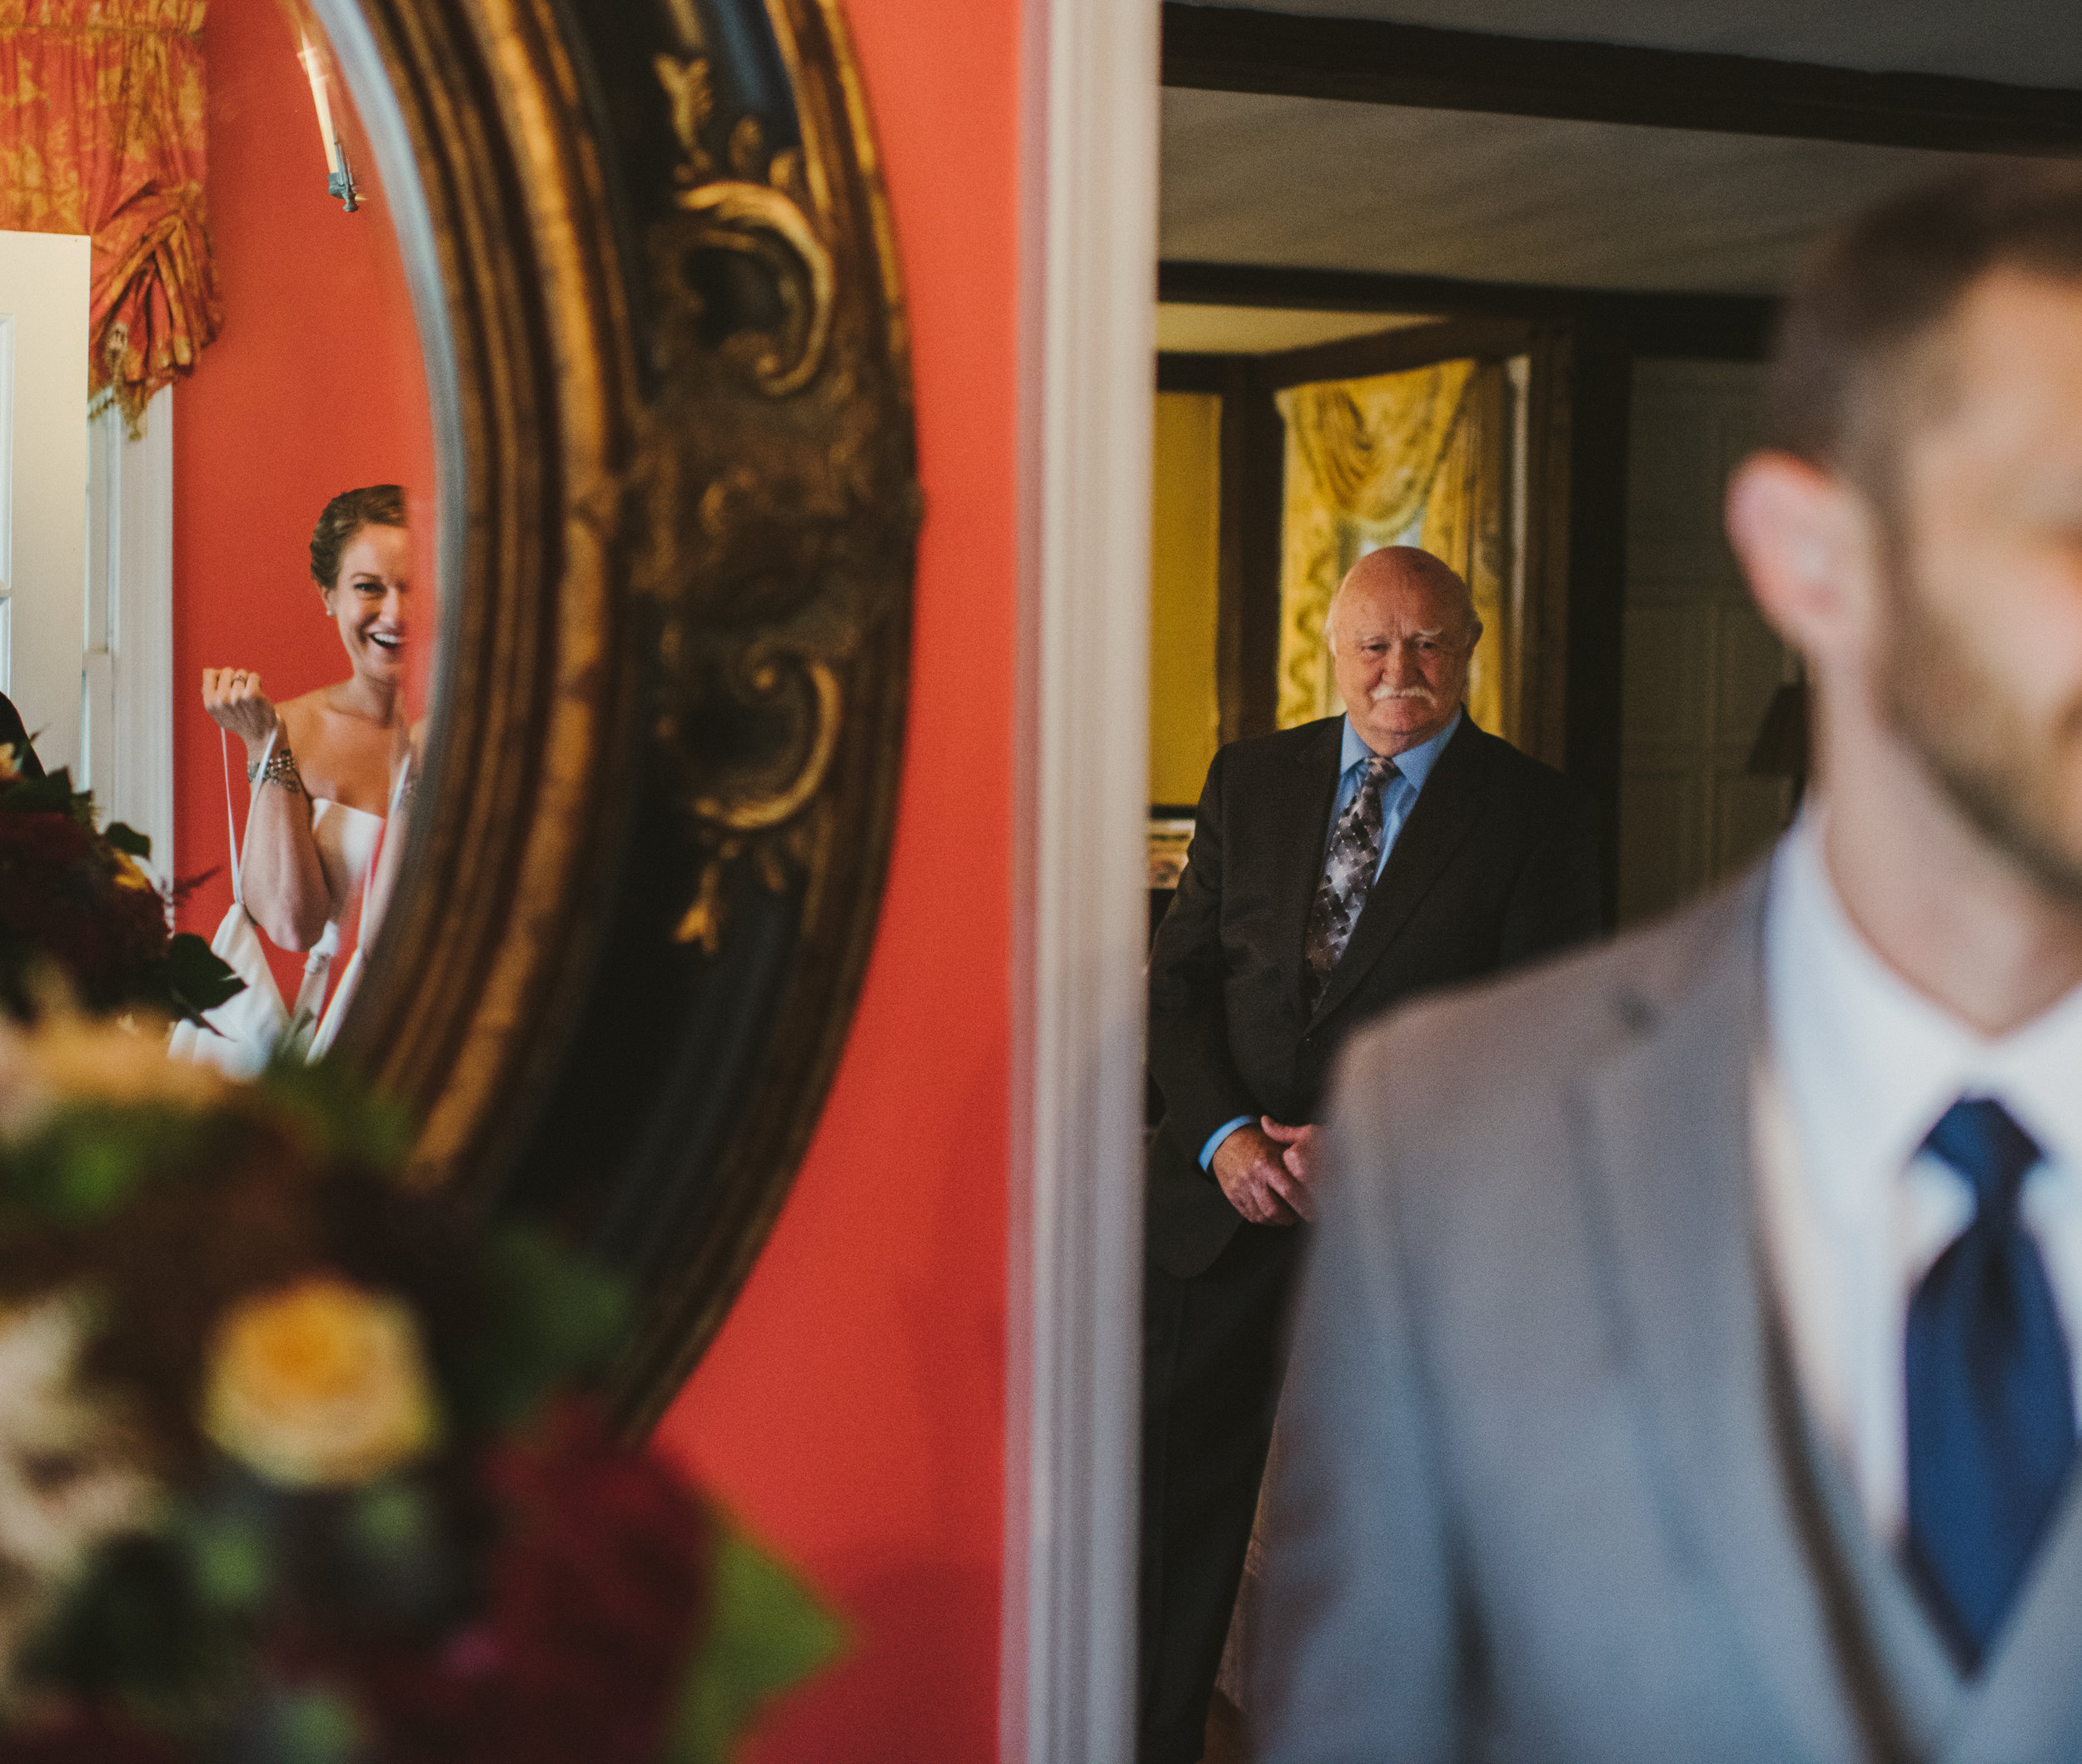 JACQUELINE & ANDREW WARSHAWER -BROOKMILL FARM FALL WEDDING - INTIMATE WEDDING PHOTOGRAPHER - TWOTWENTY by CHI-CHI AGBIM-193.jpg